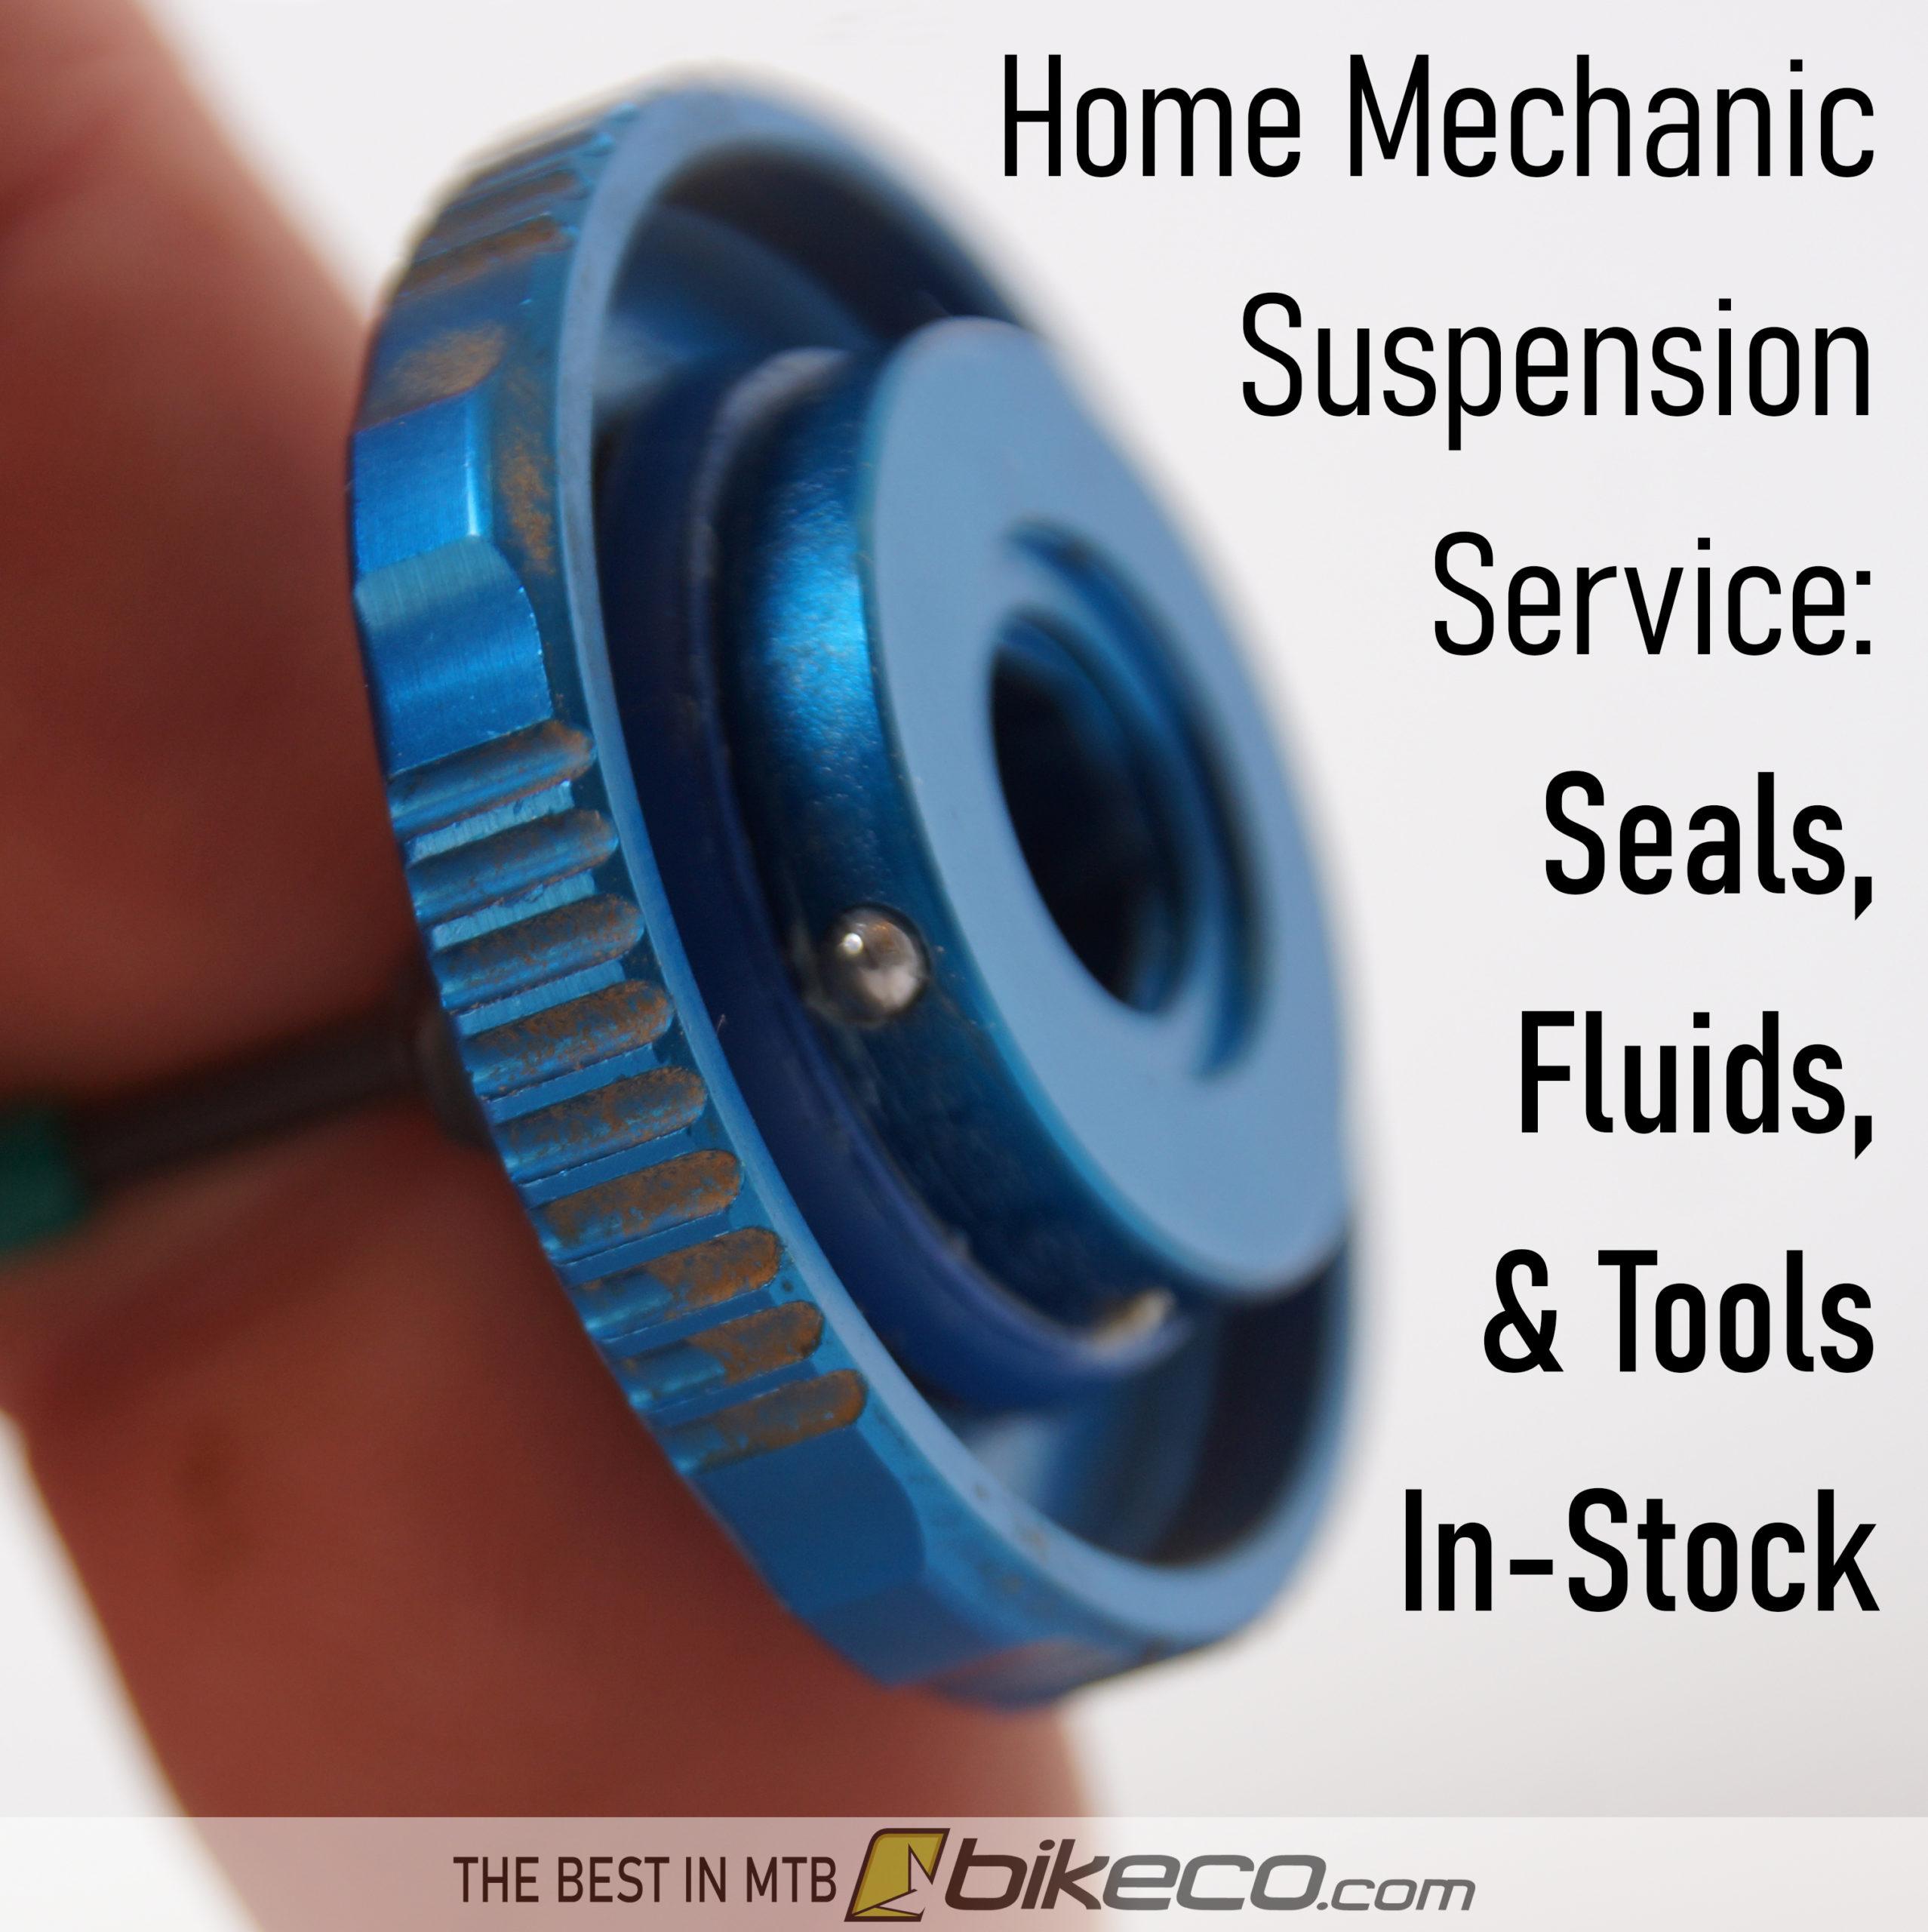 MTH Home Mechanic Suspension Maintenance Parts & Tools